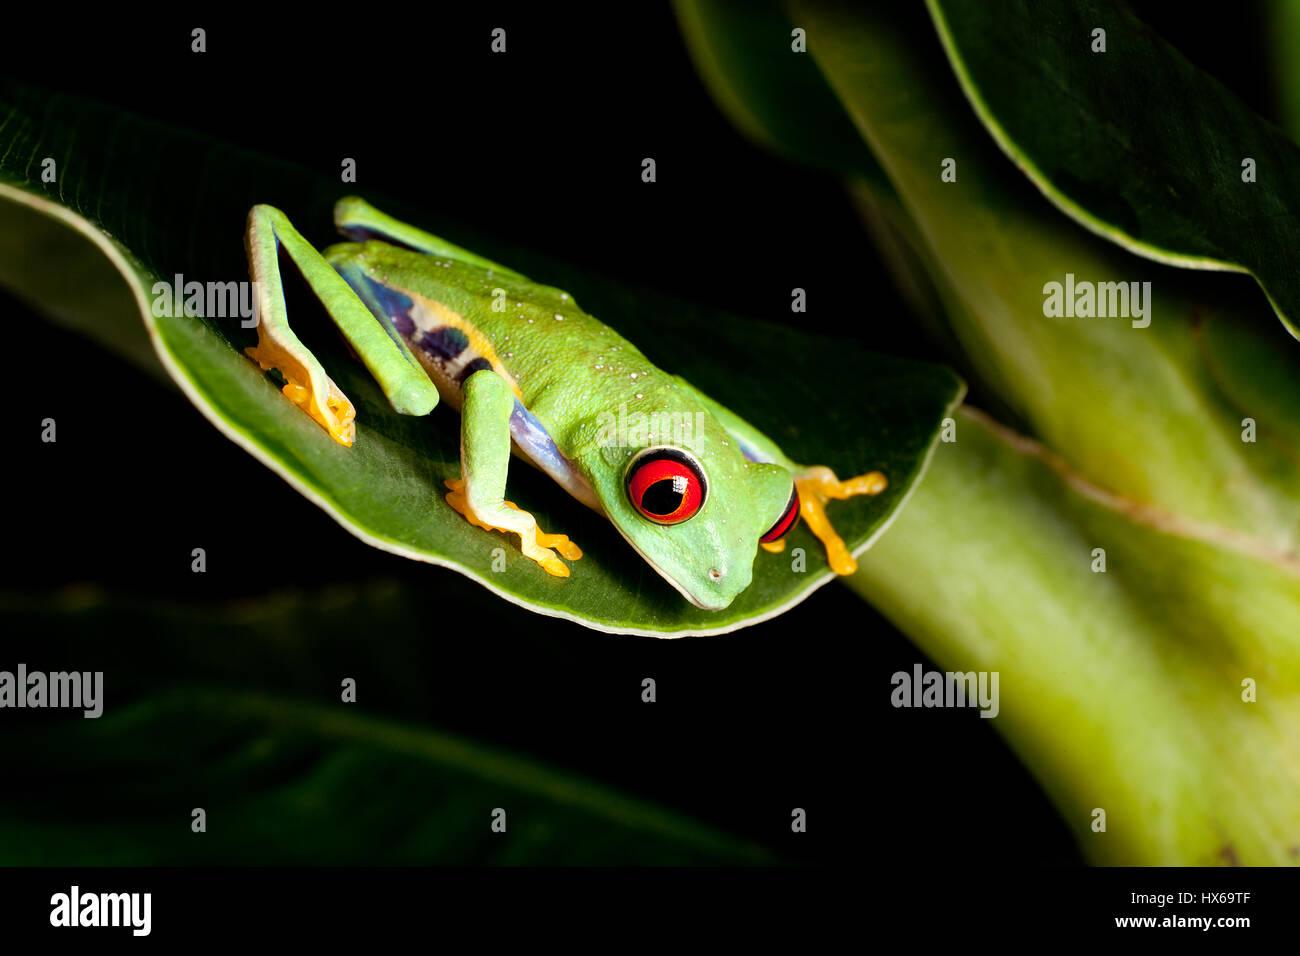 Red eyed tree frog on banana leaf - Stock Image